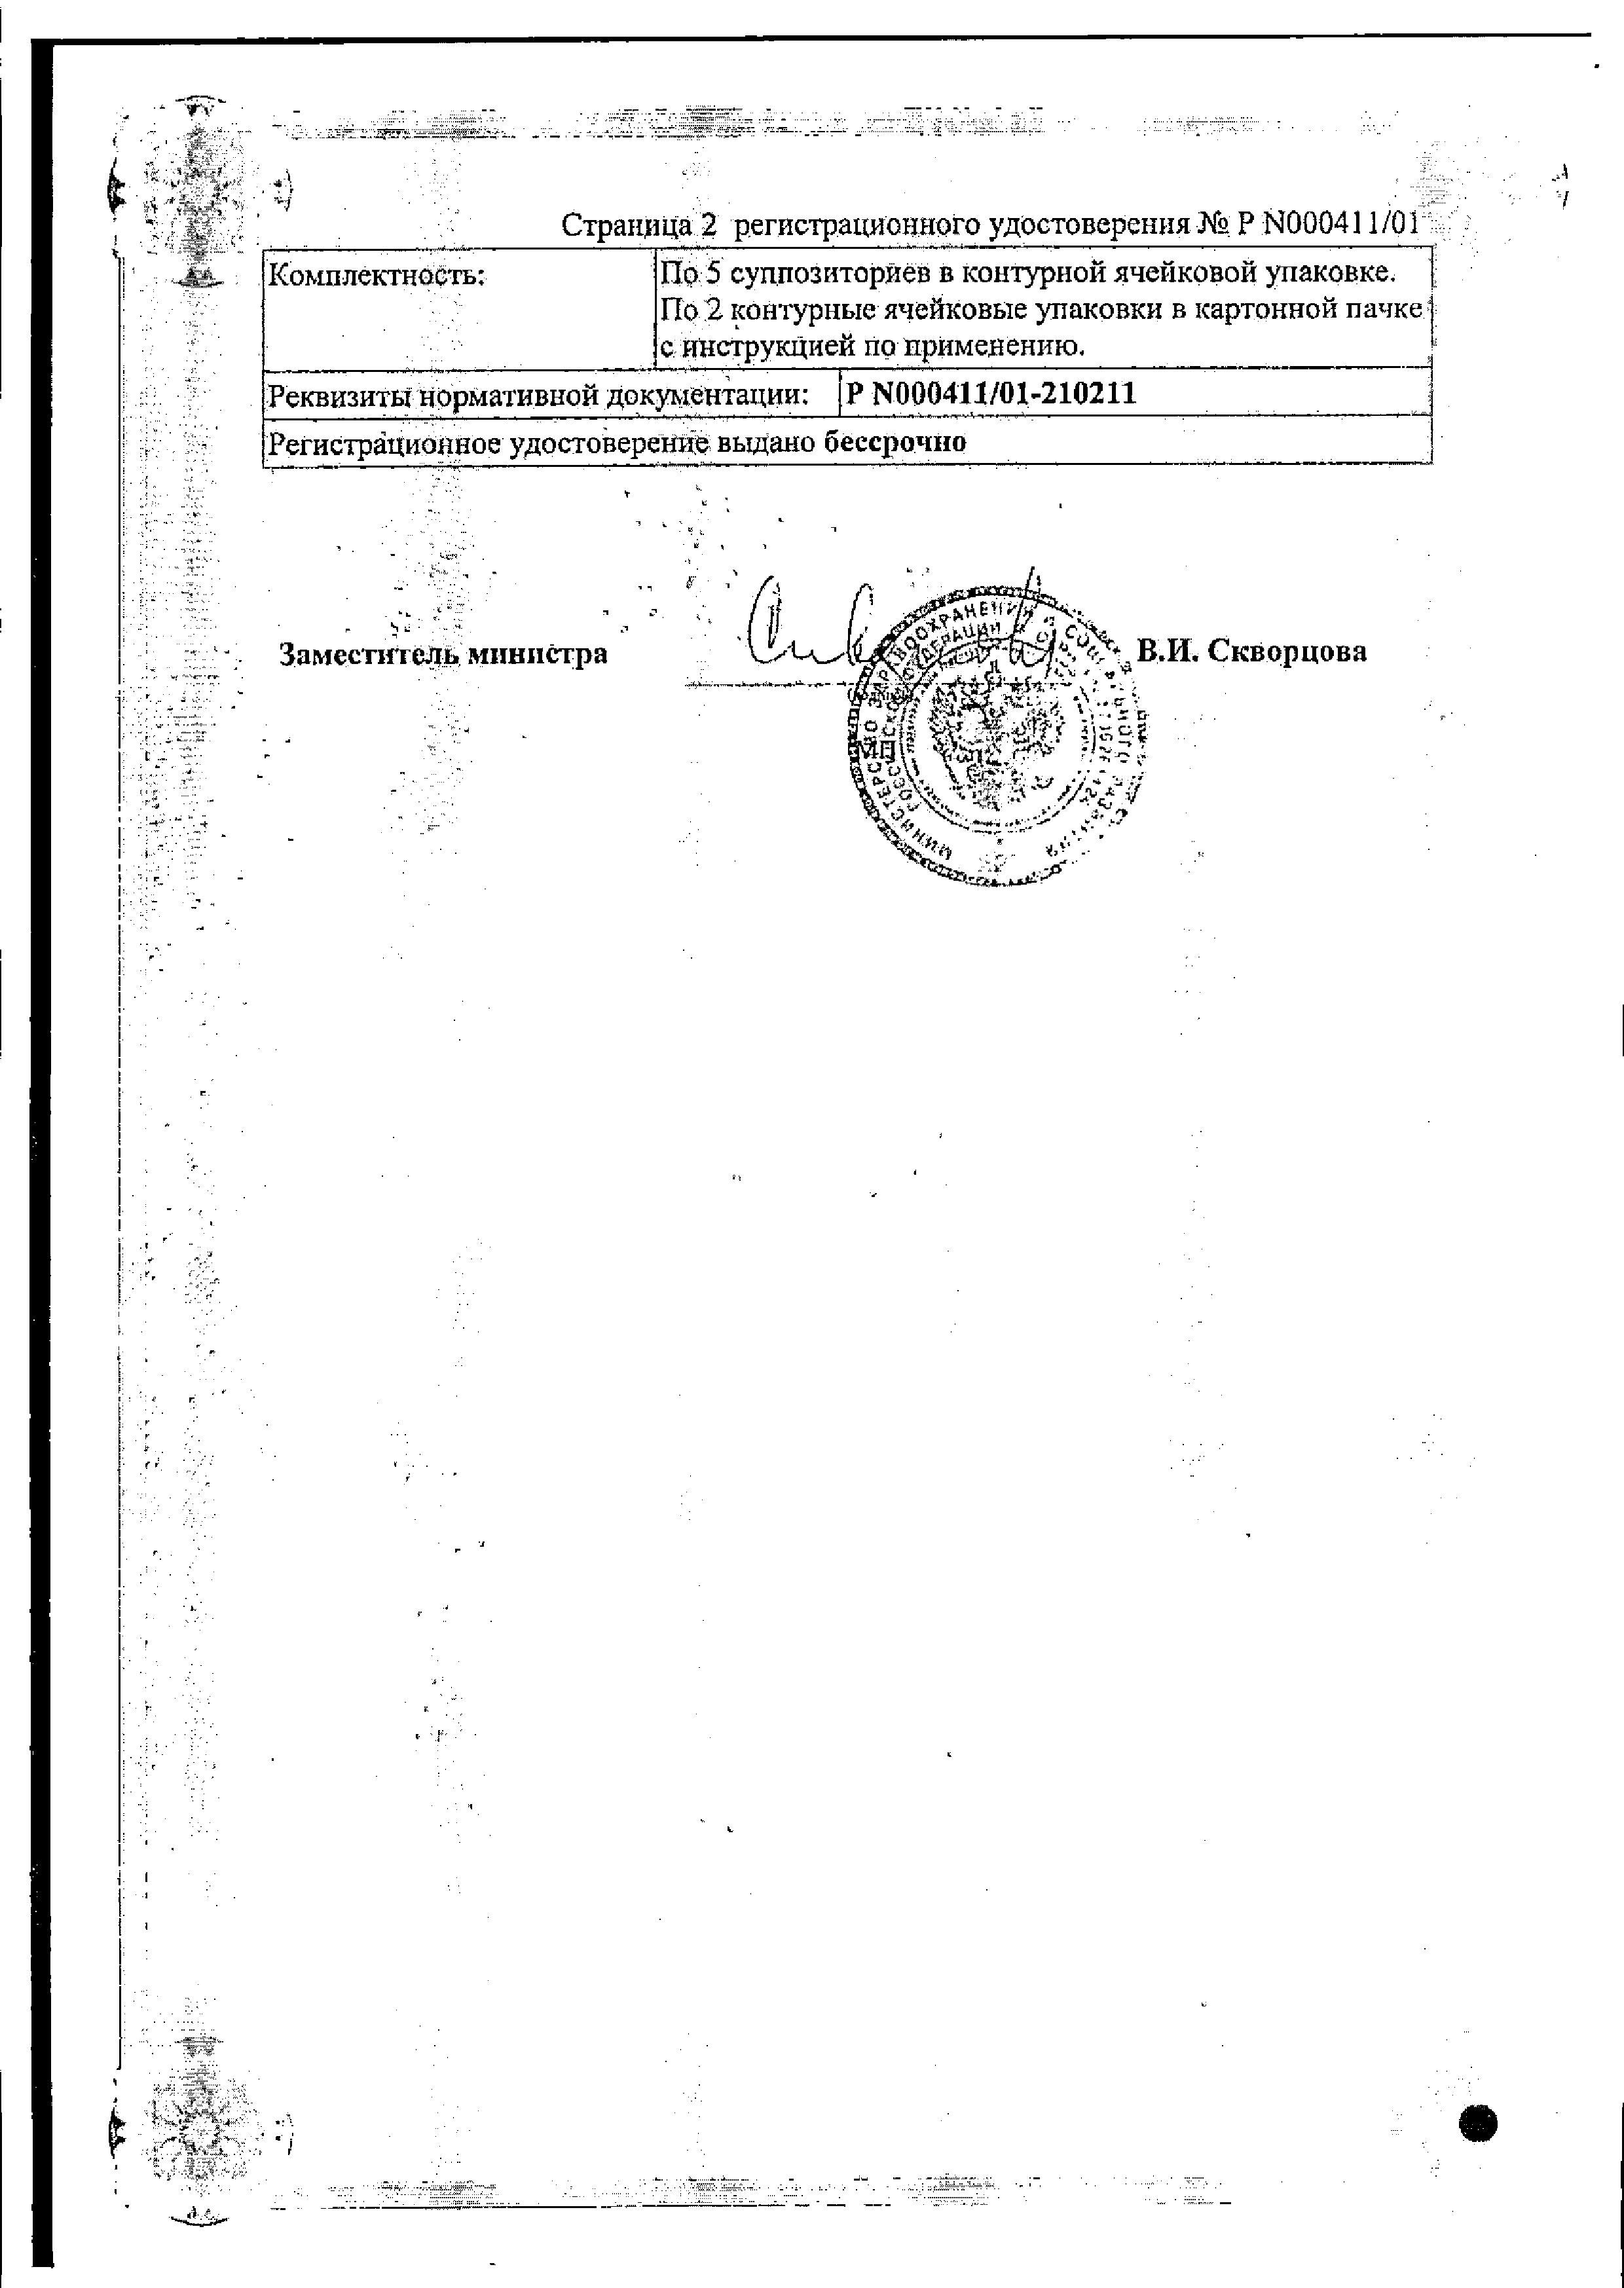 Ацилакт сертификат